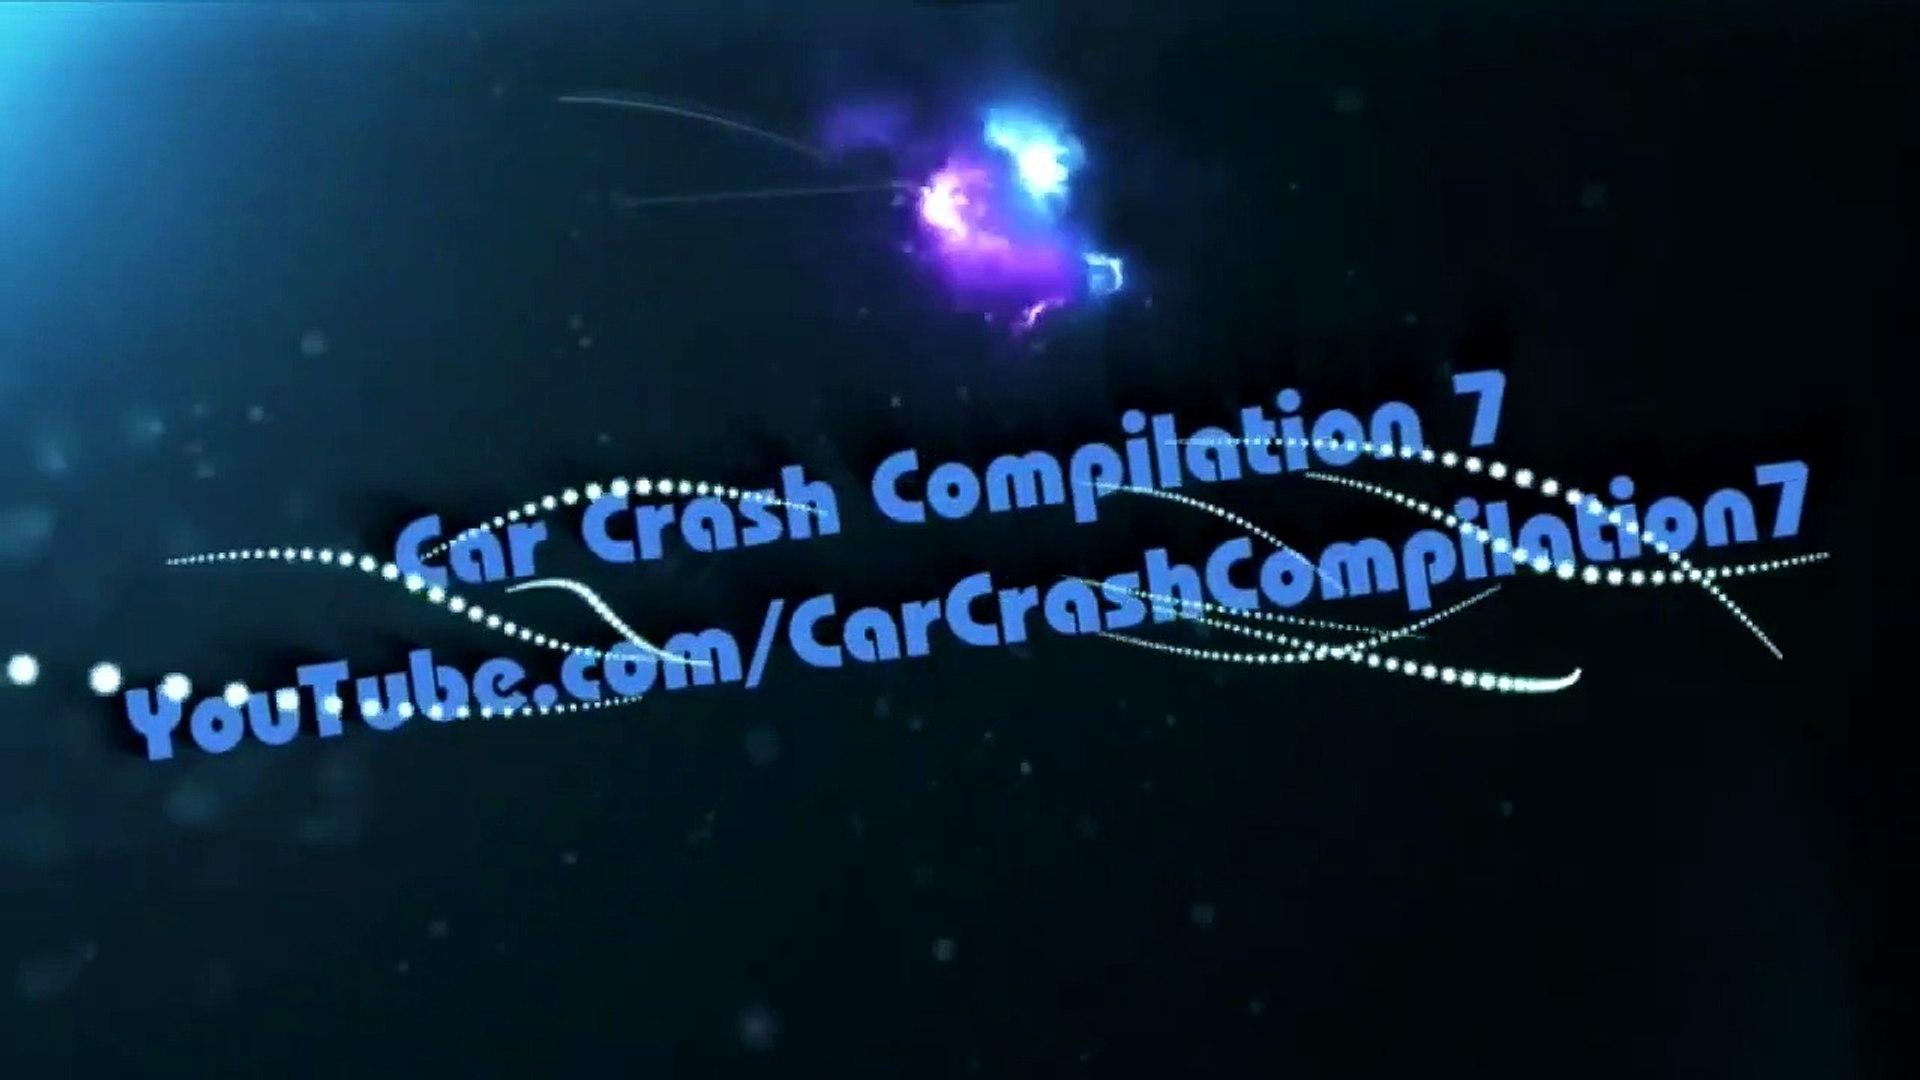 Car Crash Compilation 889 - Apr